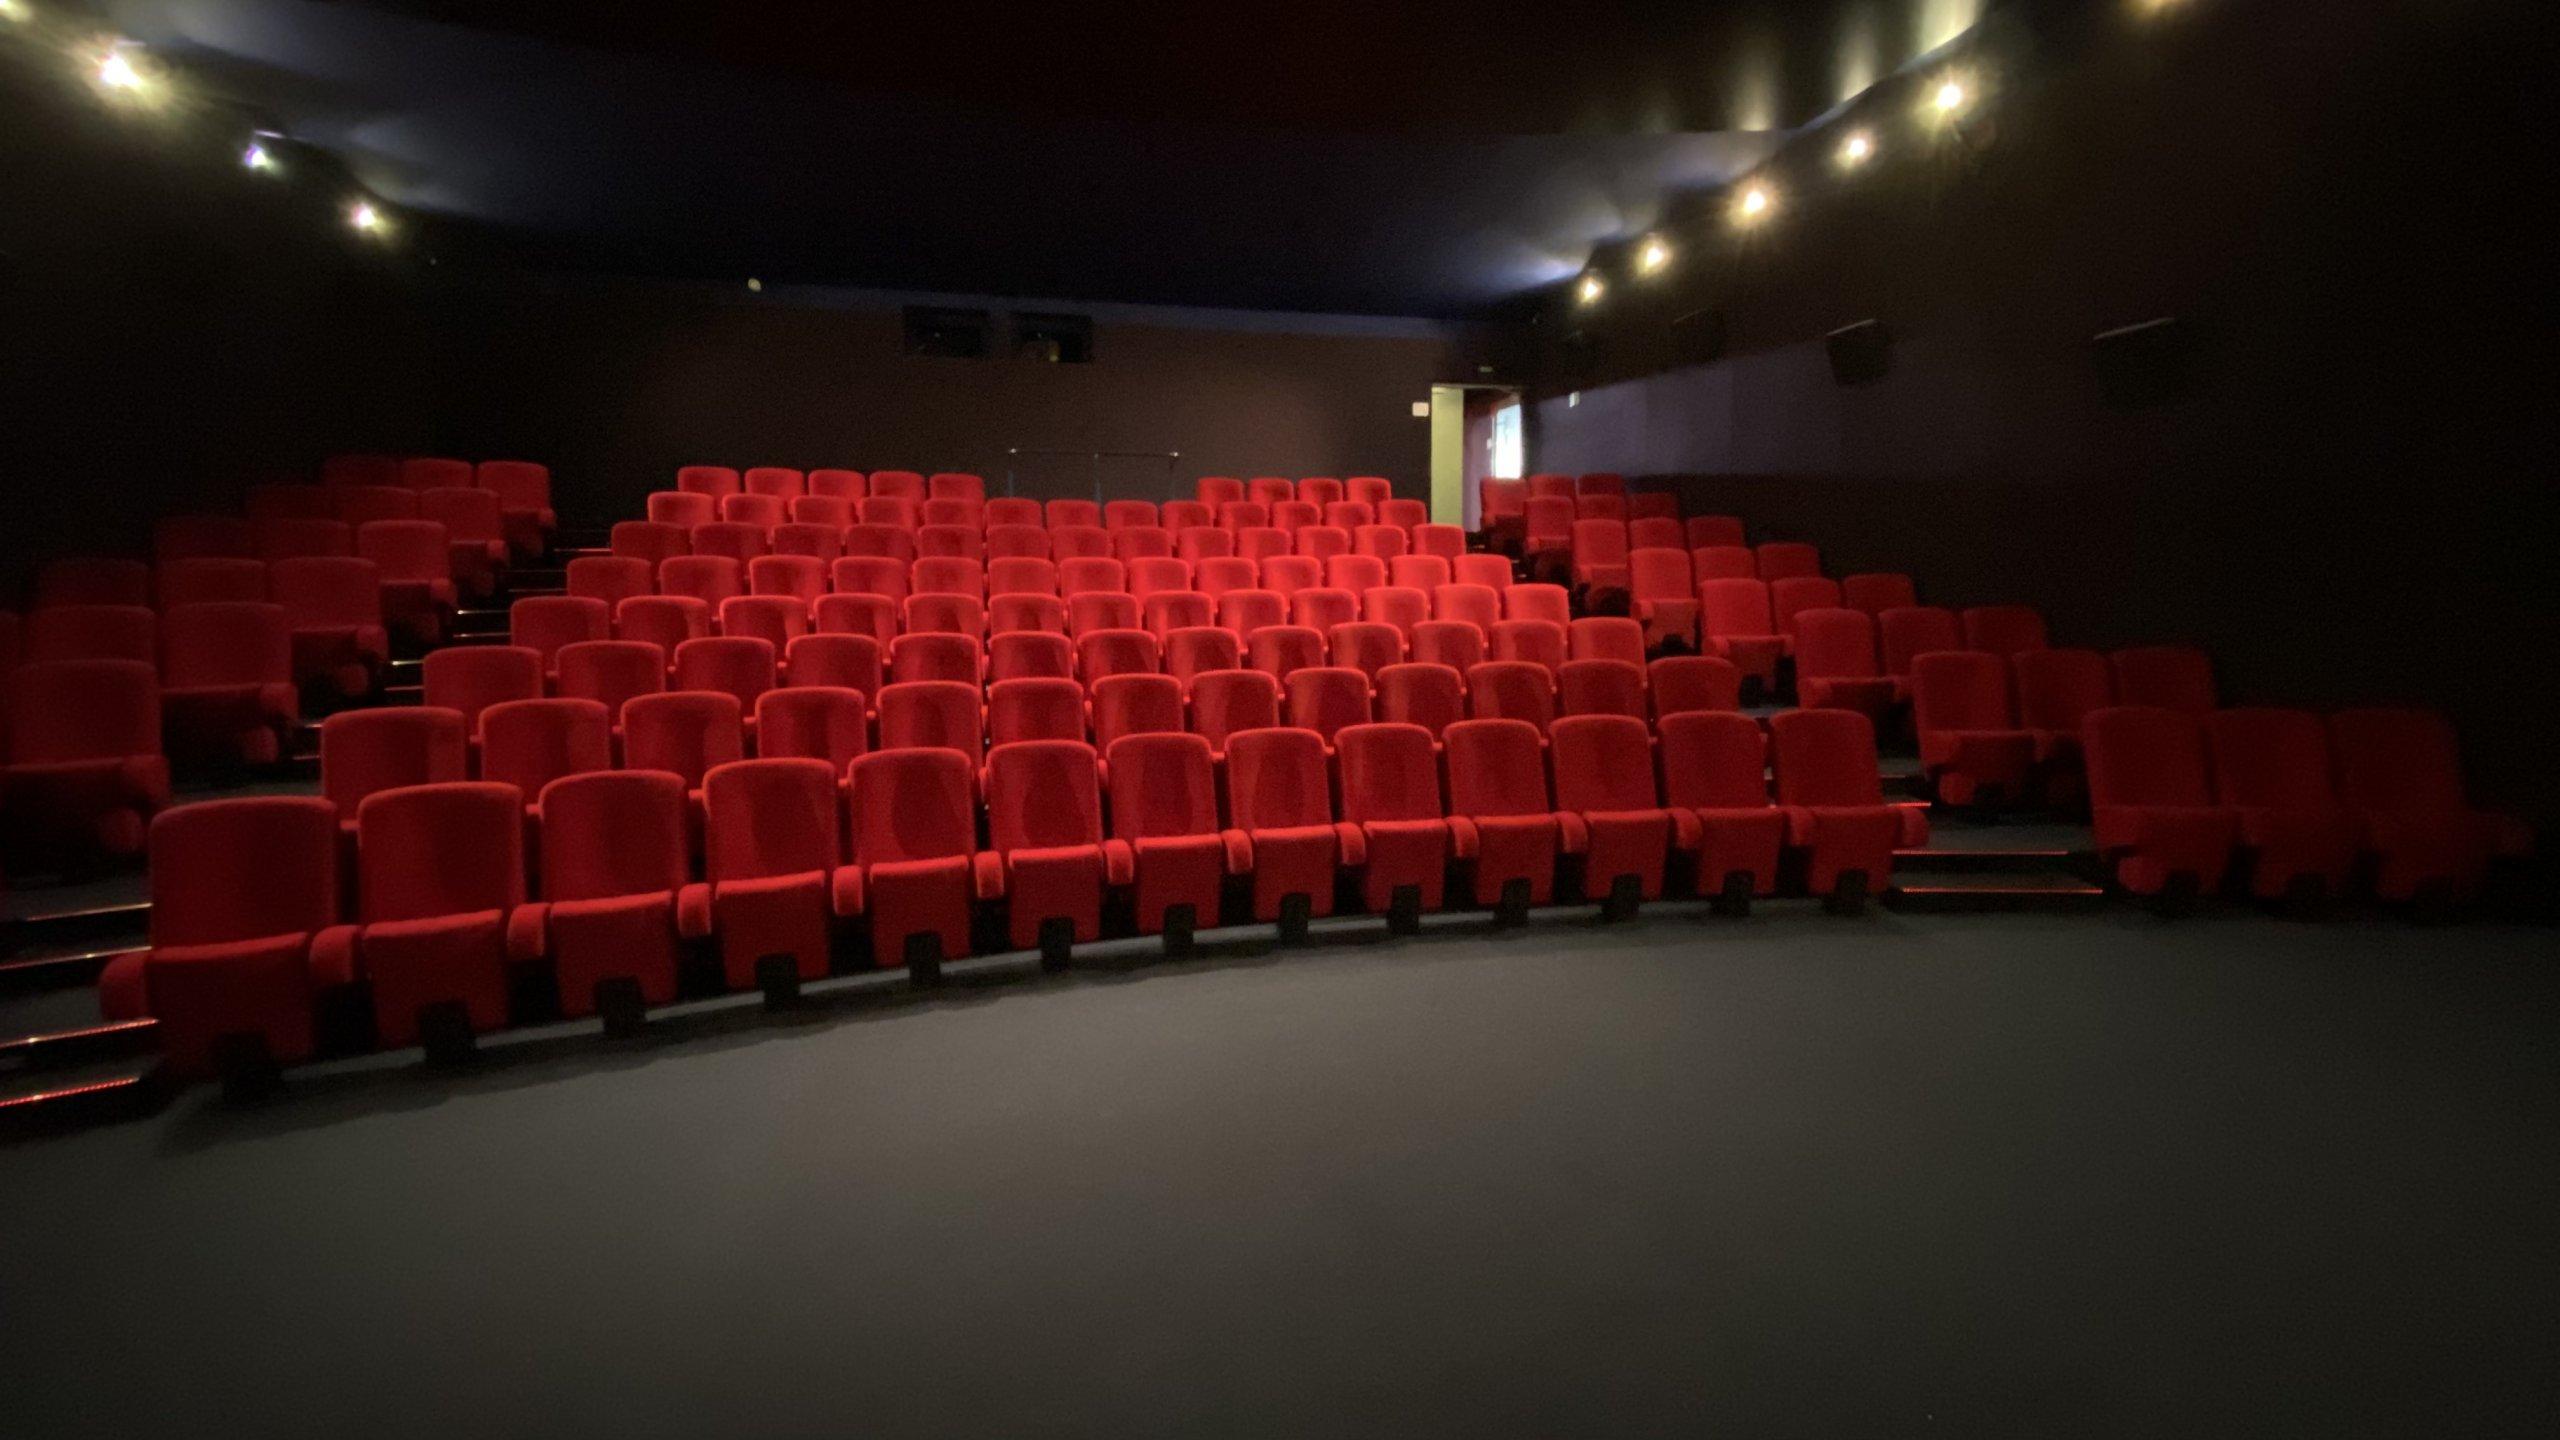 Kleslo - Puto- Leader de fabrication de fauteuils cinéma, théâtre ... cinema admosphere oyonnax v2